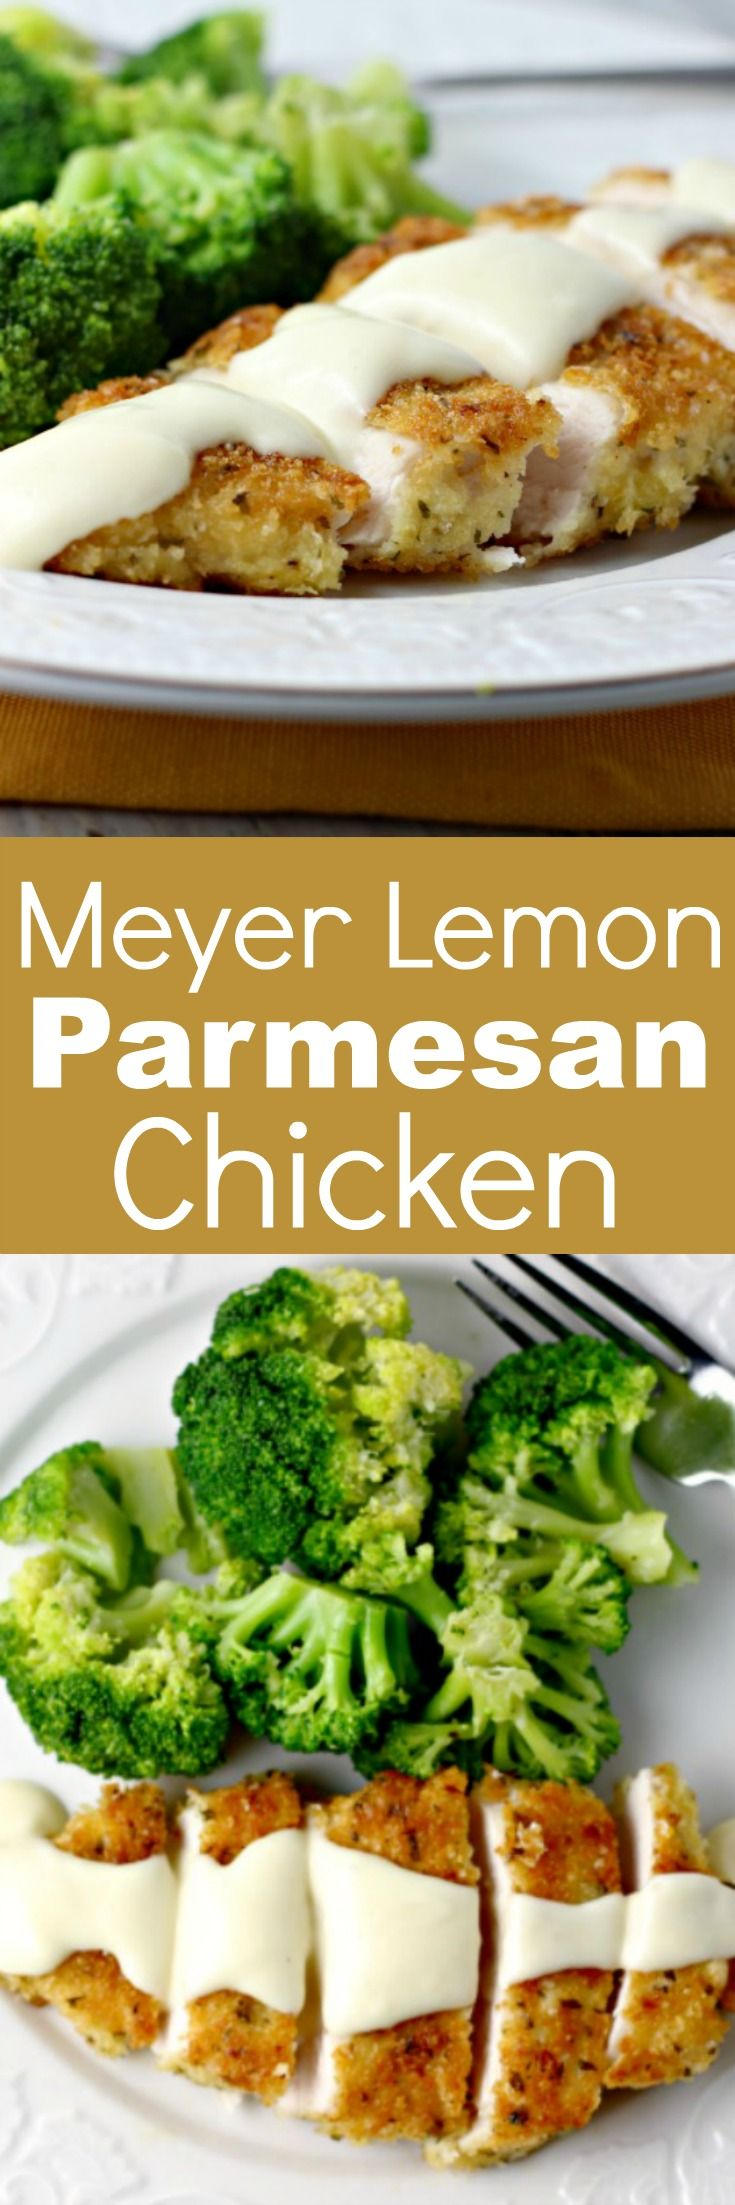 Meyer Lemon Parmesan Chicken | Renee's Kitchen Adventures:  Crispy crunchy lemony chicken with a creamy lemon sauce!  Ready in about 30 minutes!